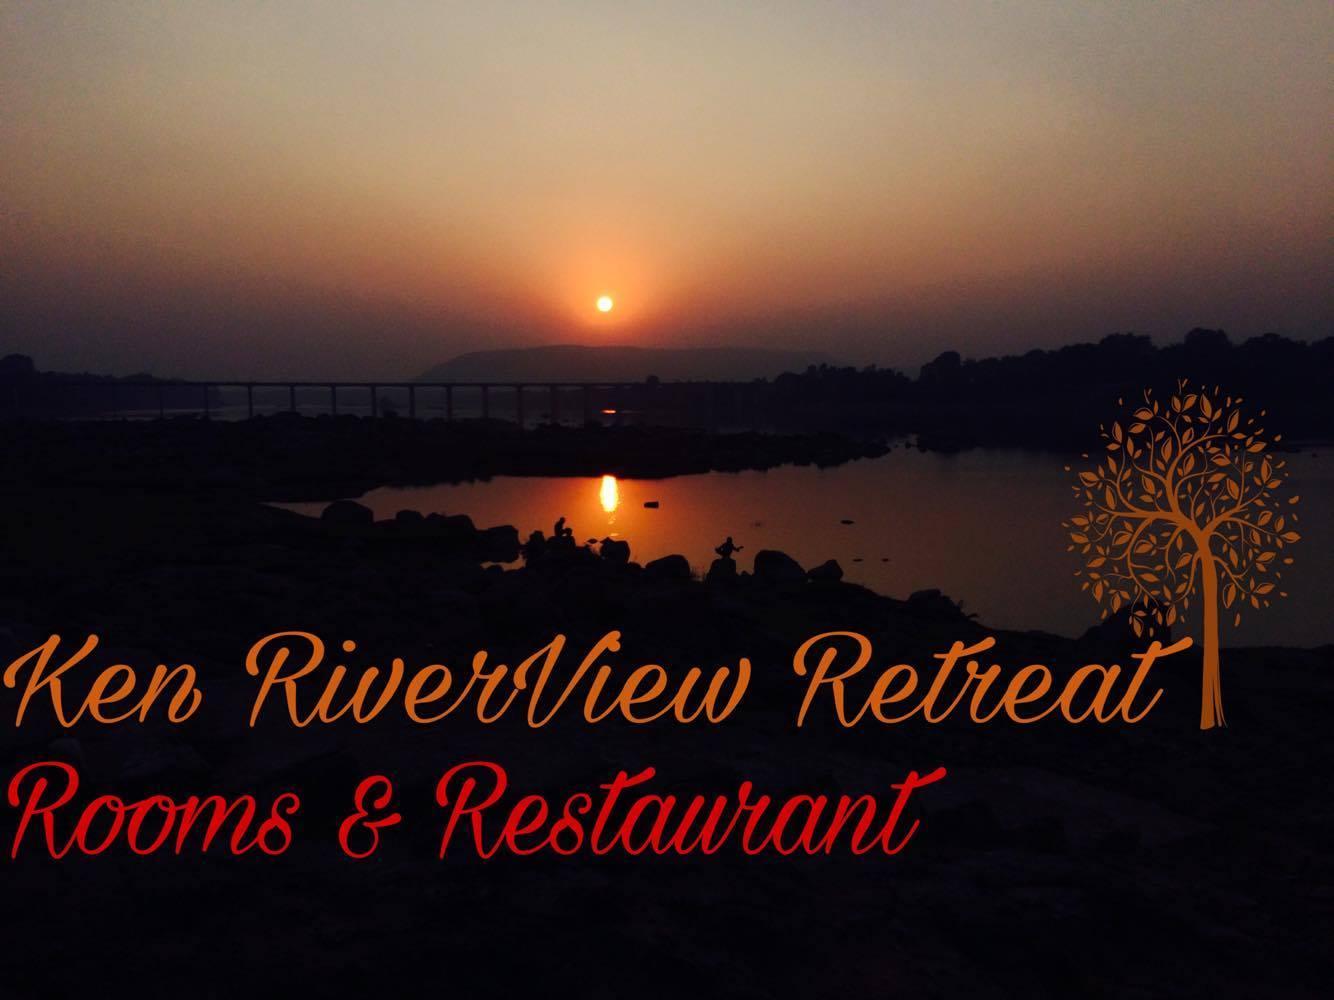 Ken Riverview Retreat